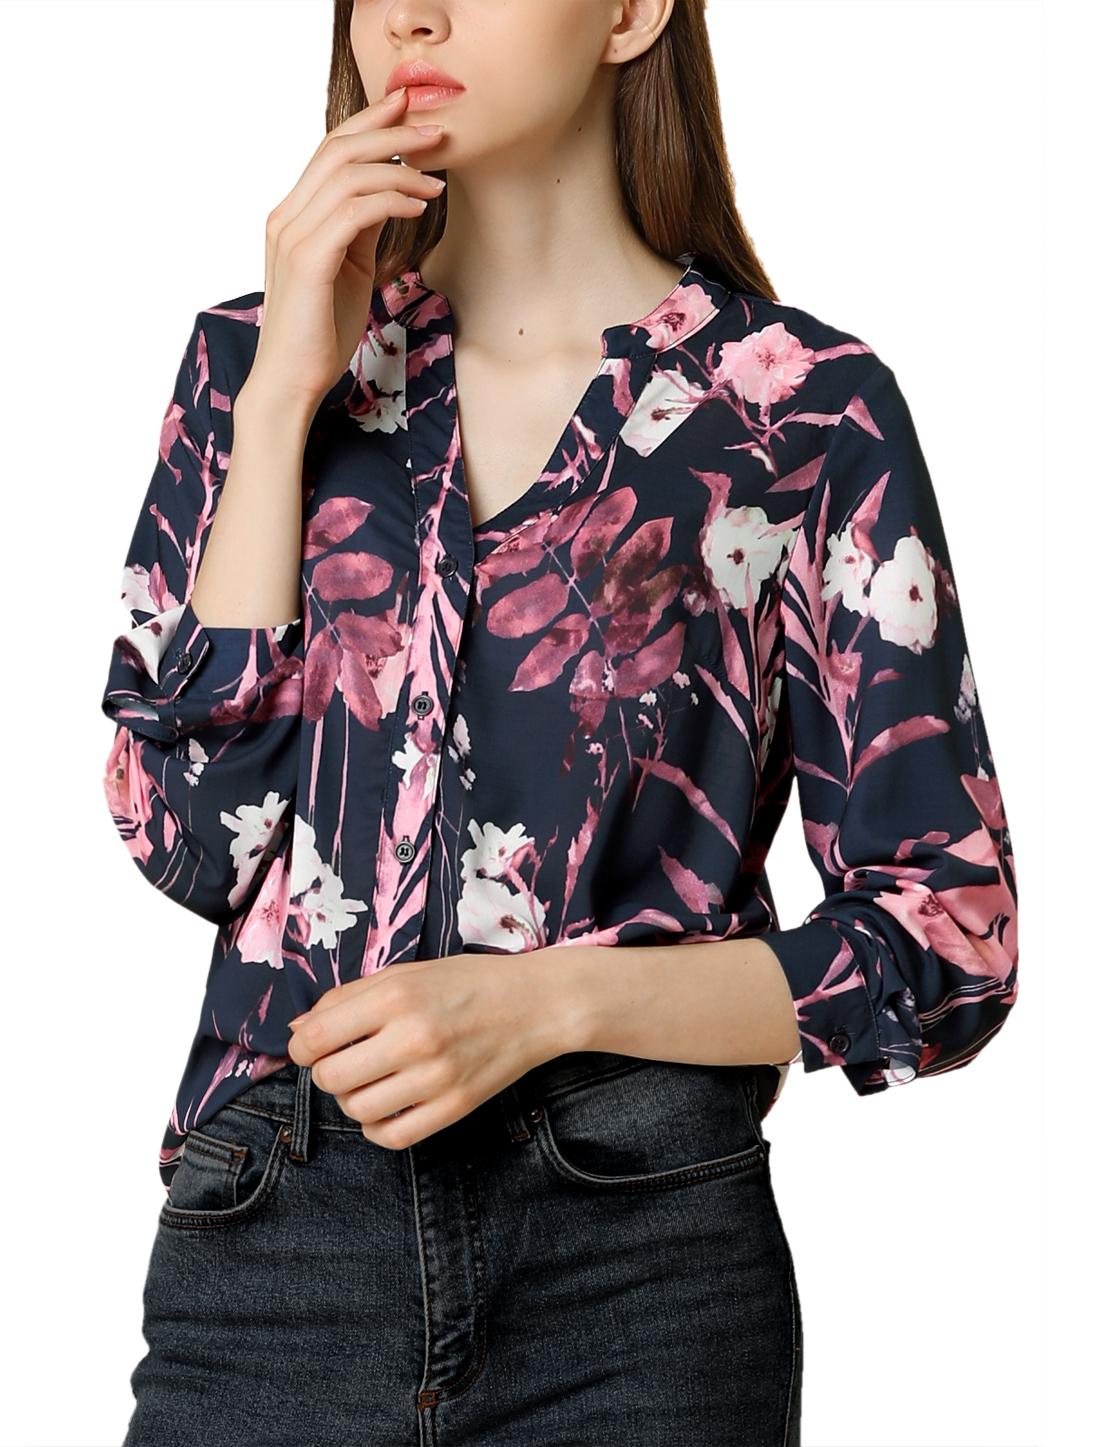 Allegra K Women's Button Down Stand Collar V Neck Floral Blouse Navy Blue S